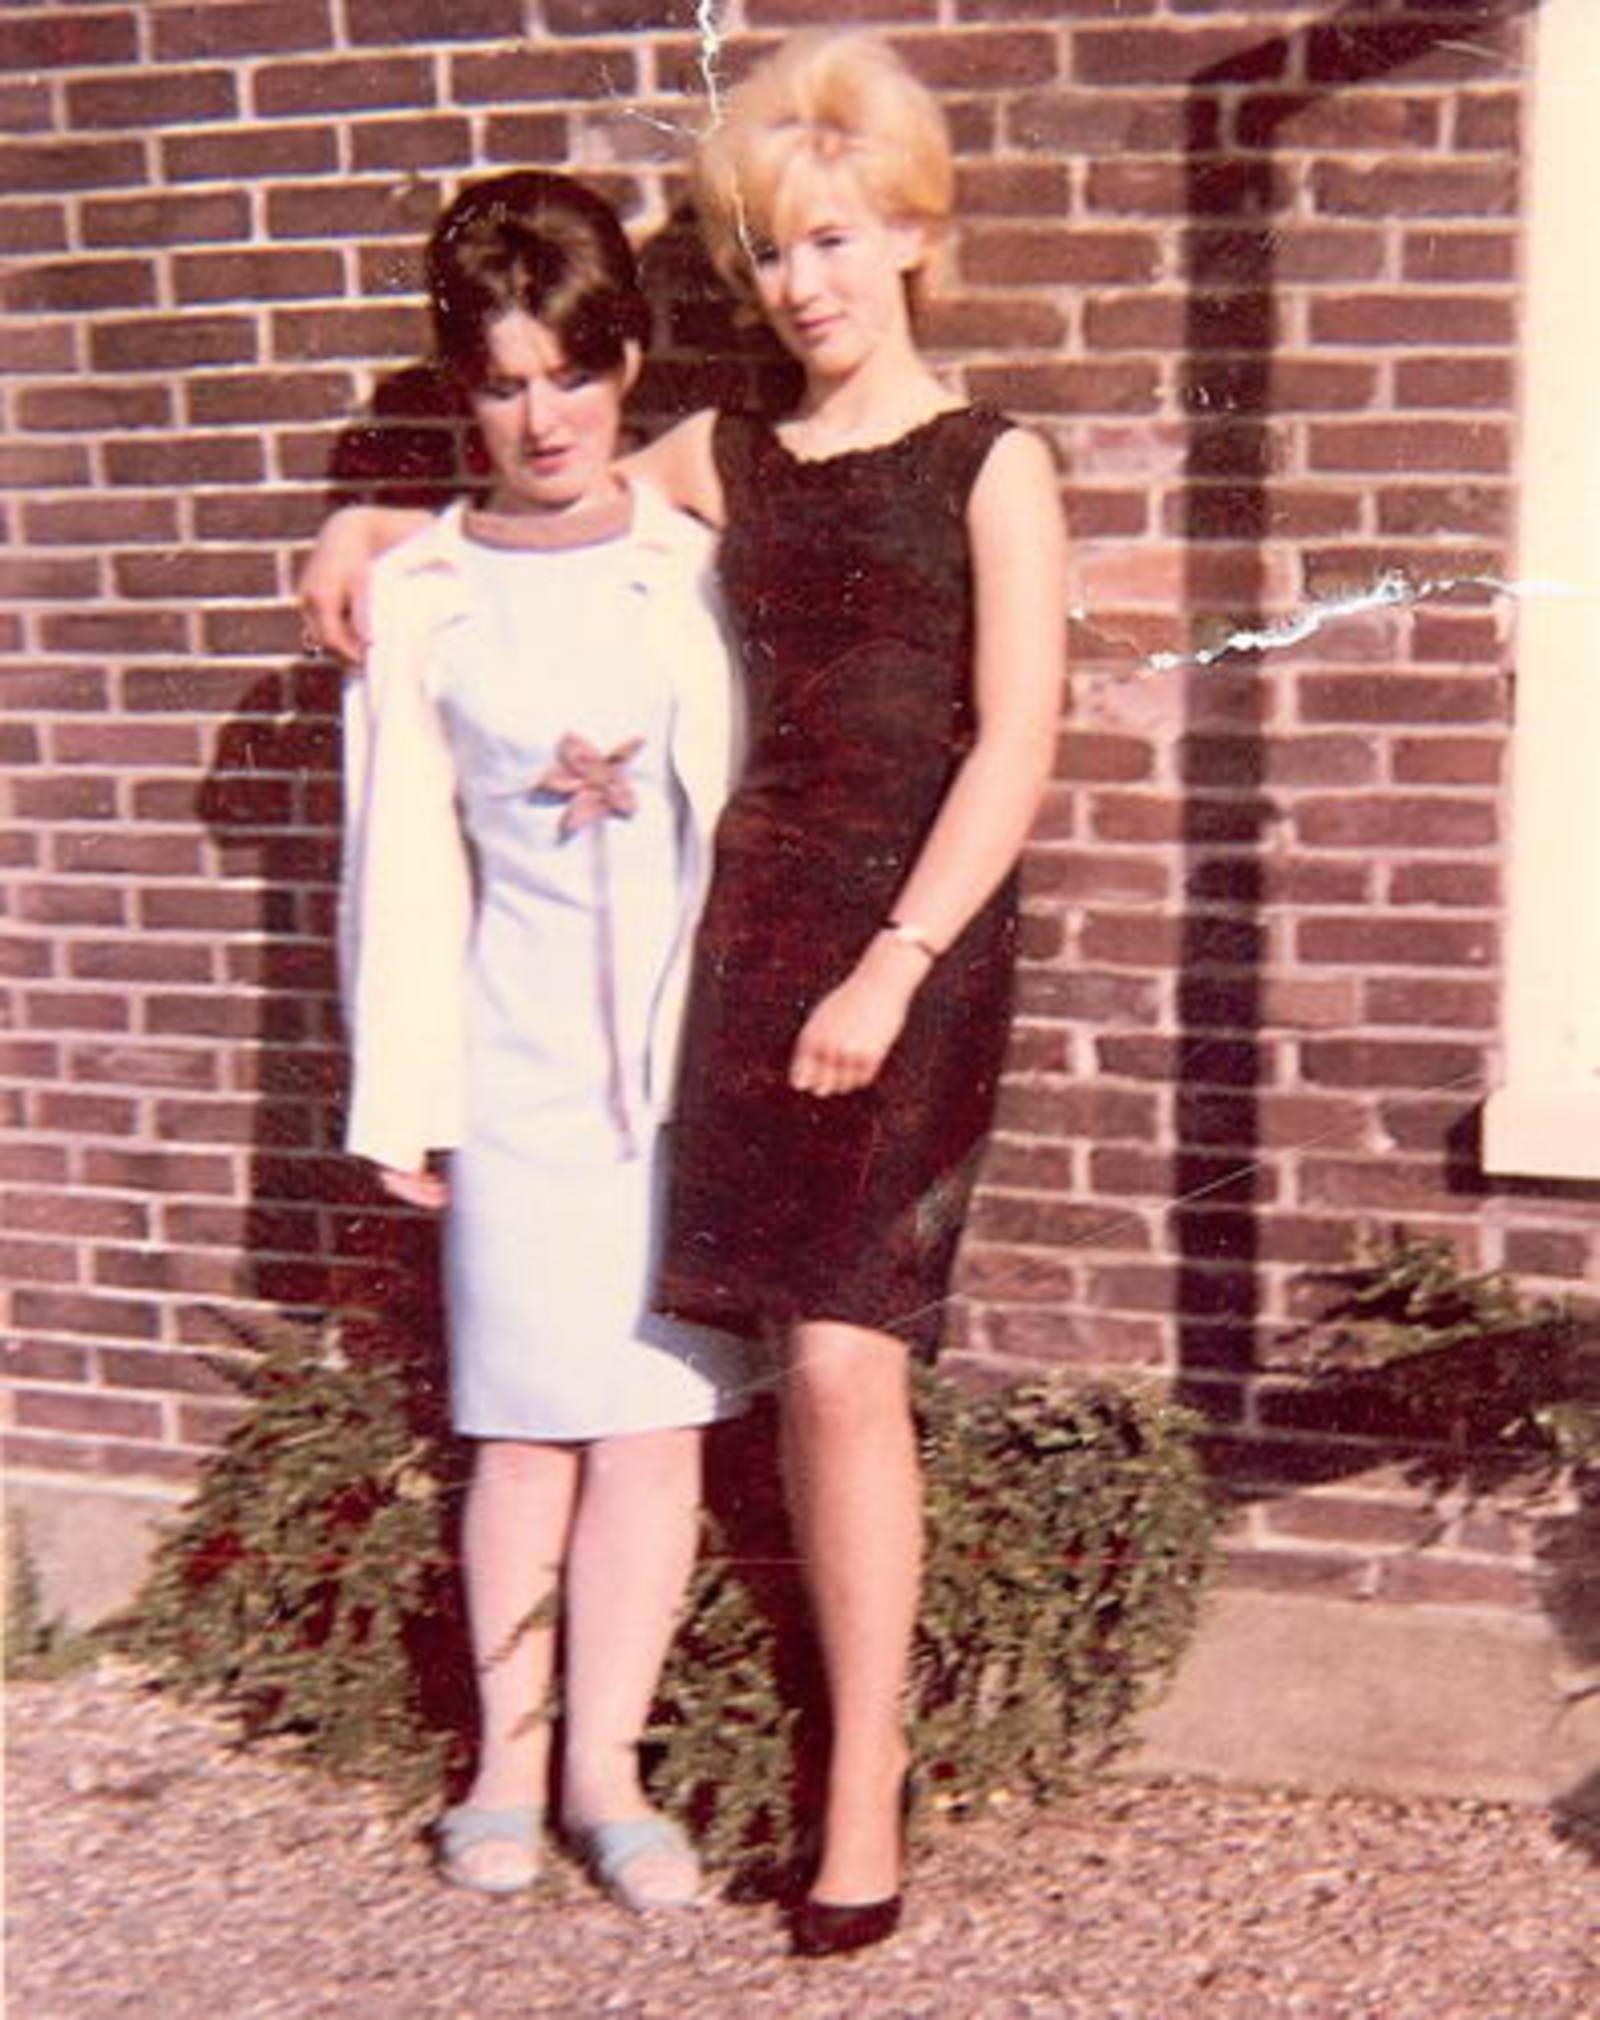 Imanse Corrie 1948 1966 met zus Rina